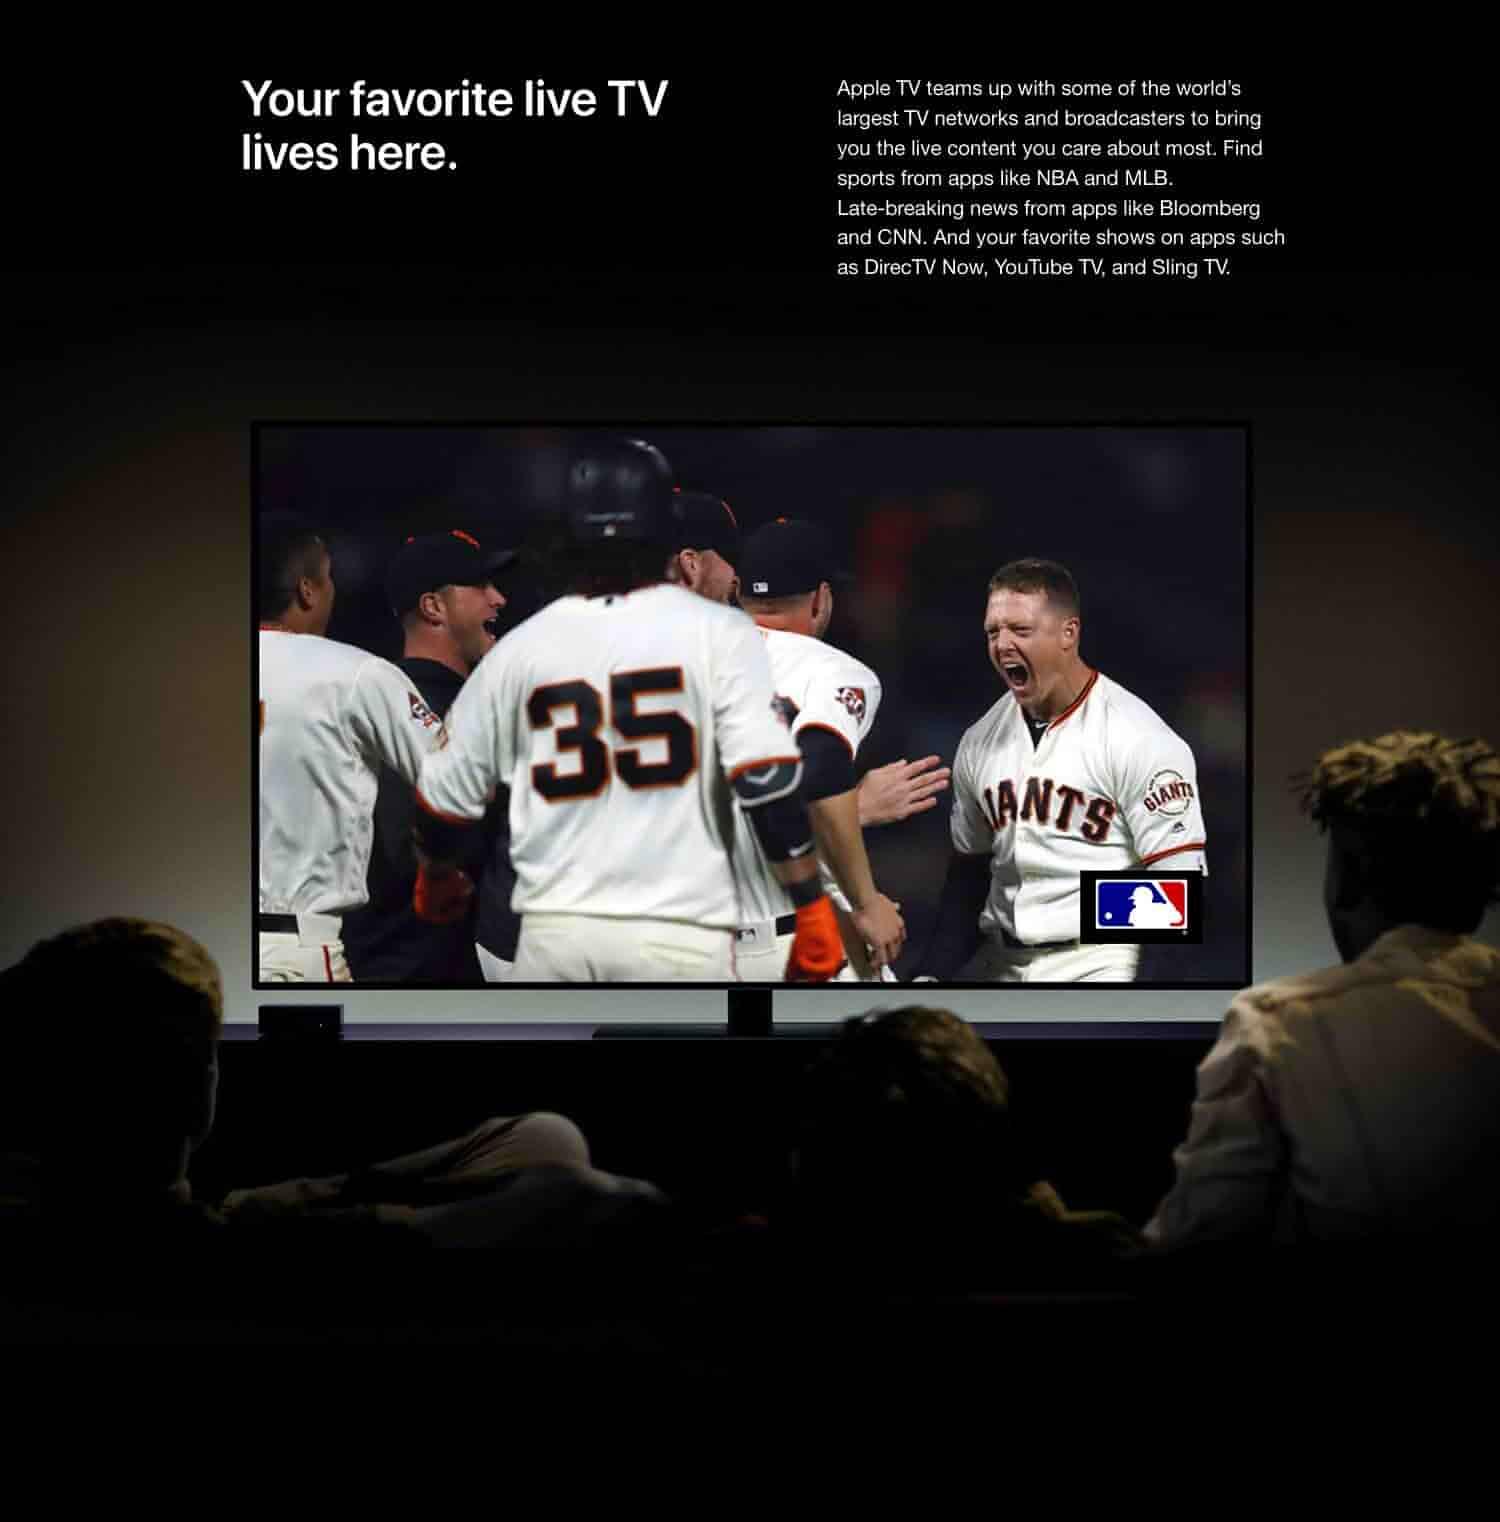 Amazoncom Apple Tv 4k 64gb Latest Model Amazon Devices